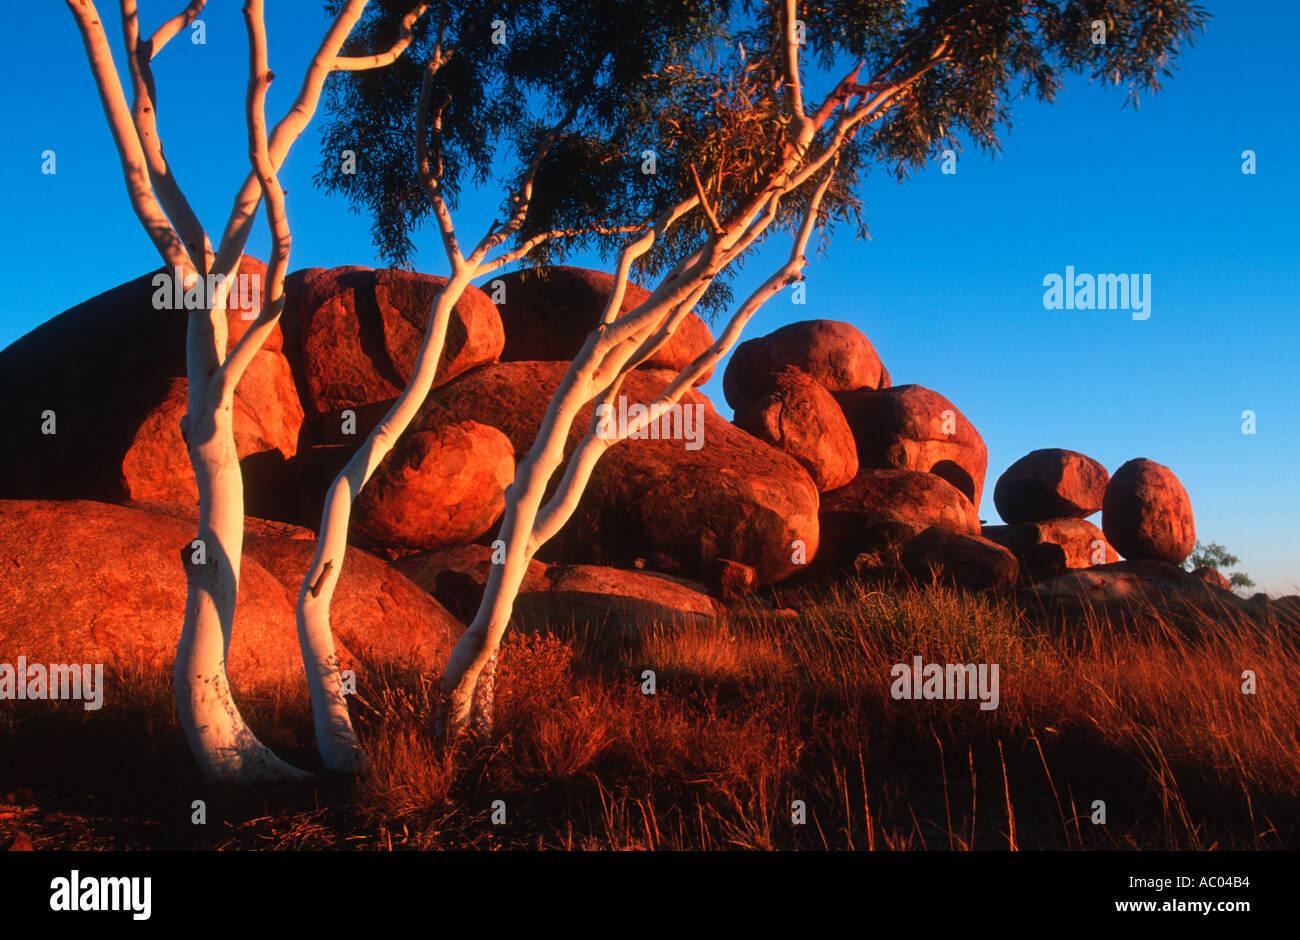 Landschaft Devils Marbles Northern Territory Australien Stockbild